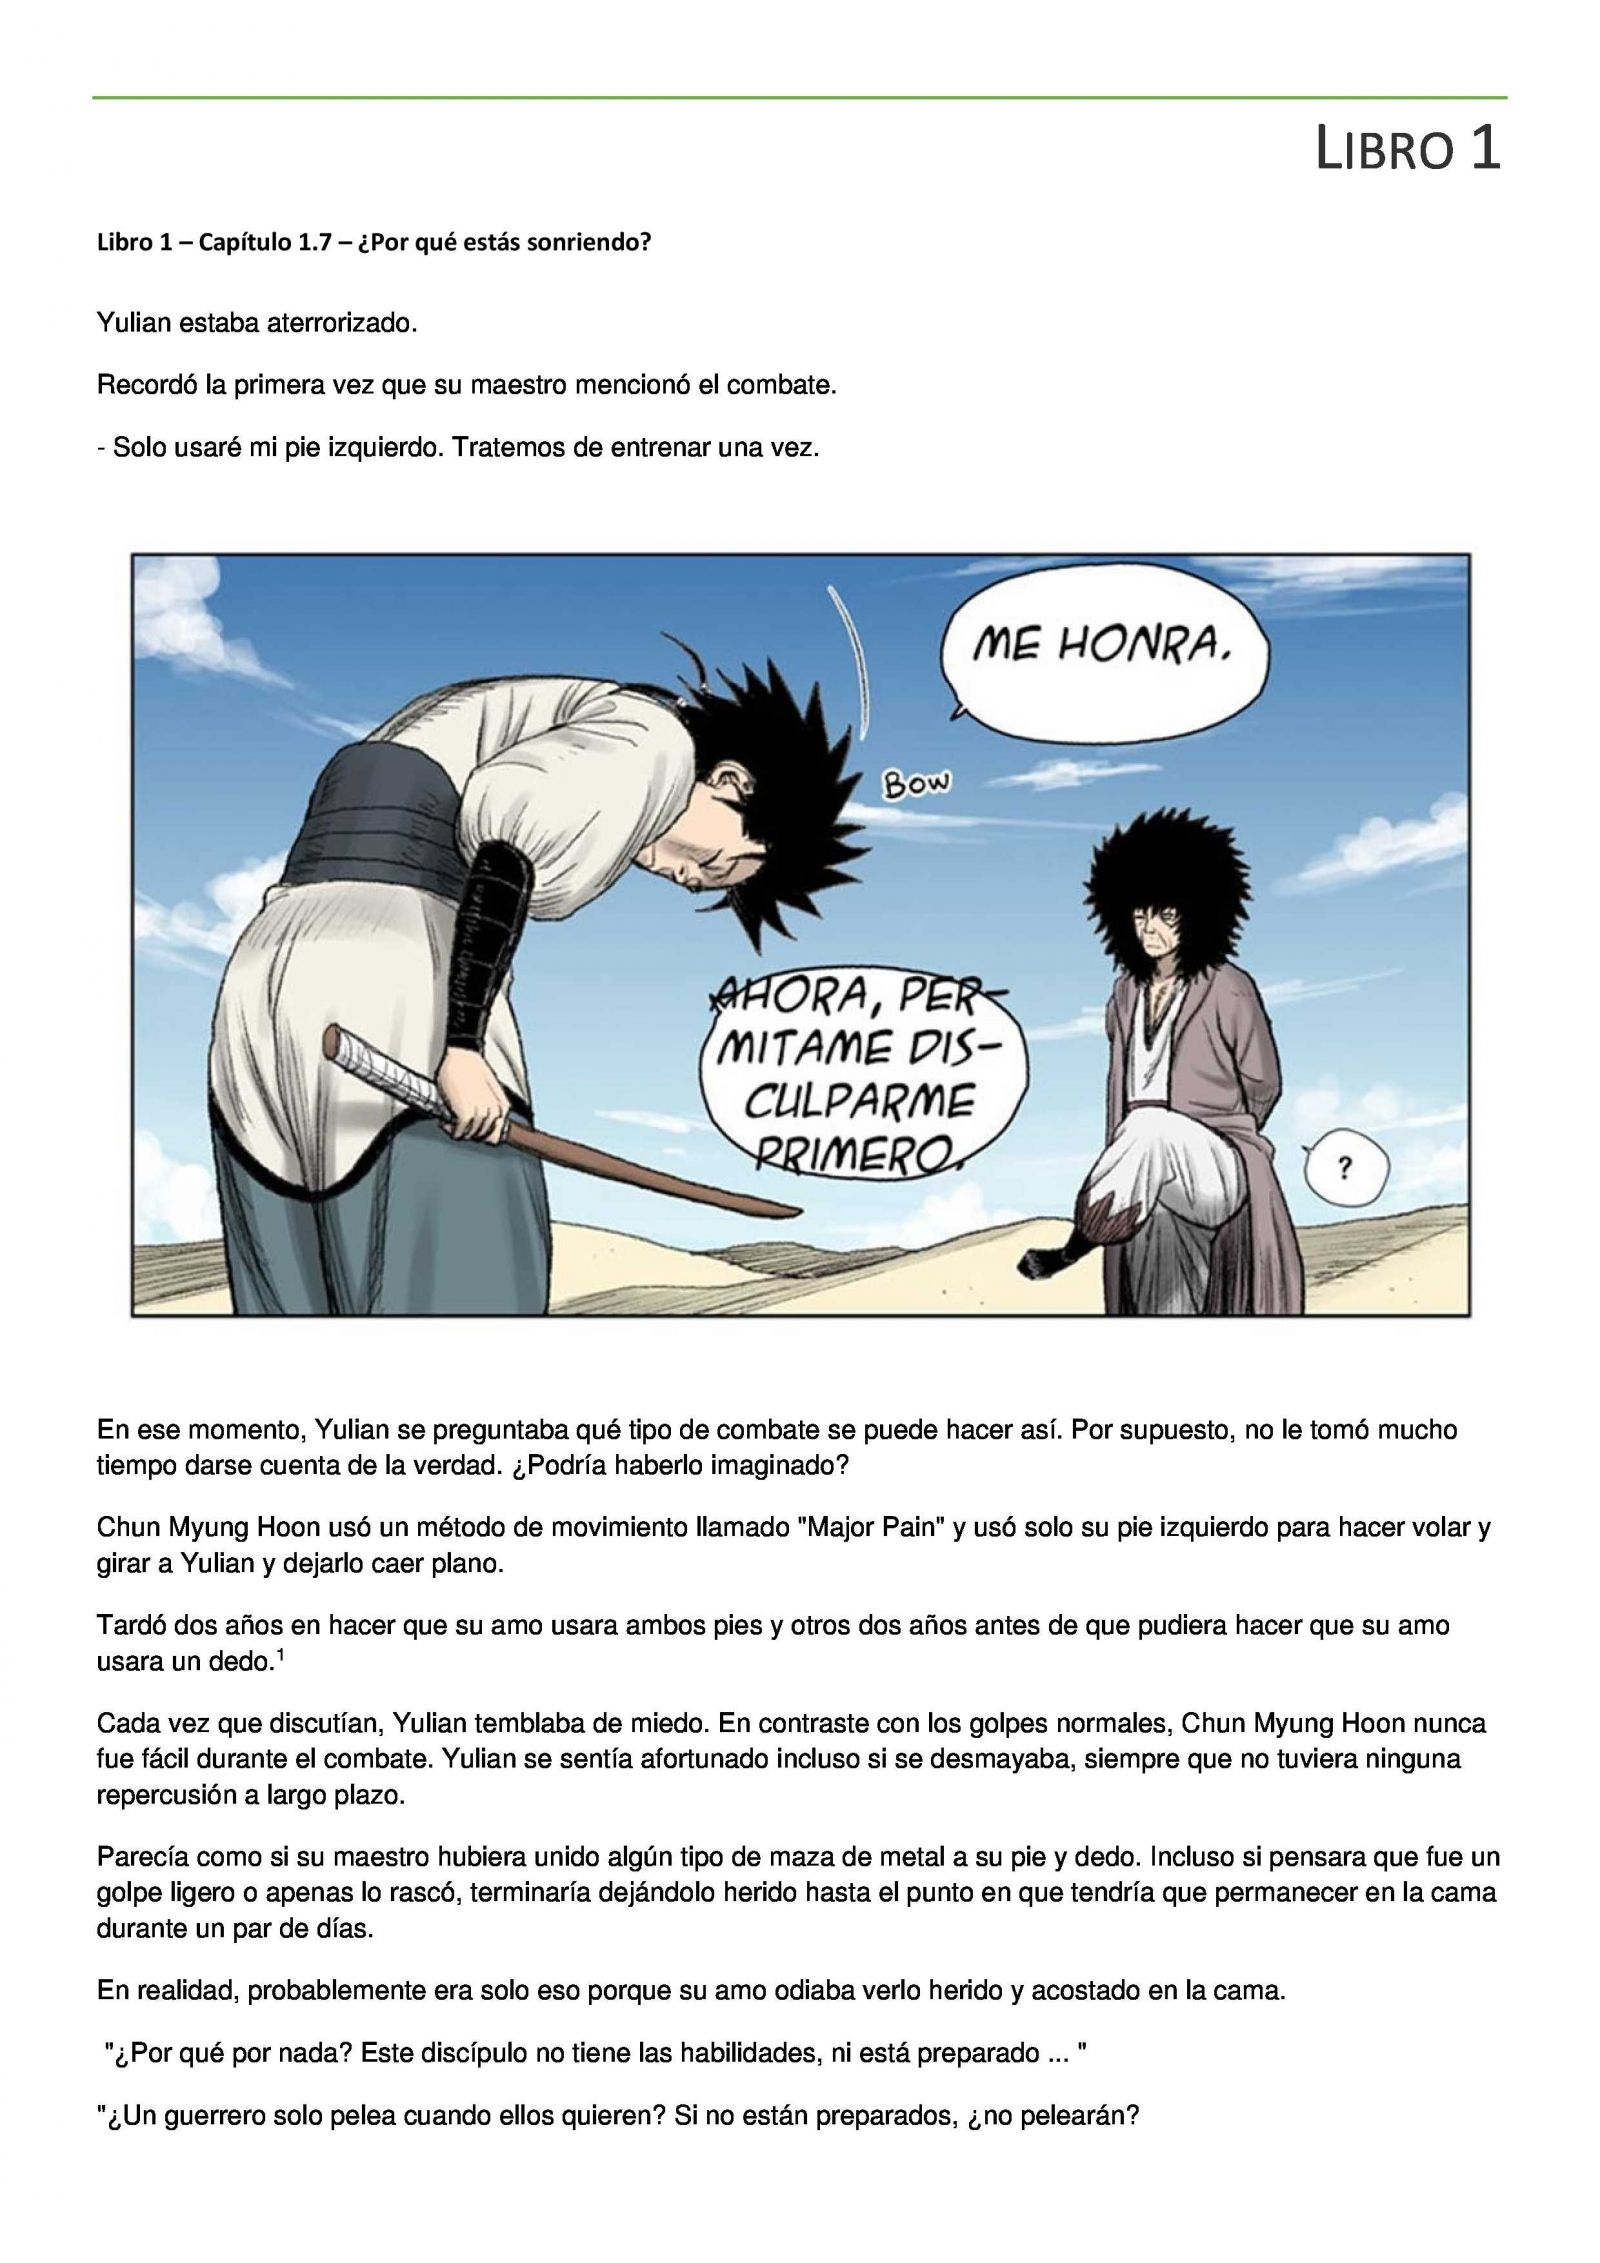 https://c9.mangatag.com/es_manga/pic4/55/24695/621305/d5d4b8c0aae499457c7320750efbf51d.jpg Page 1